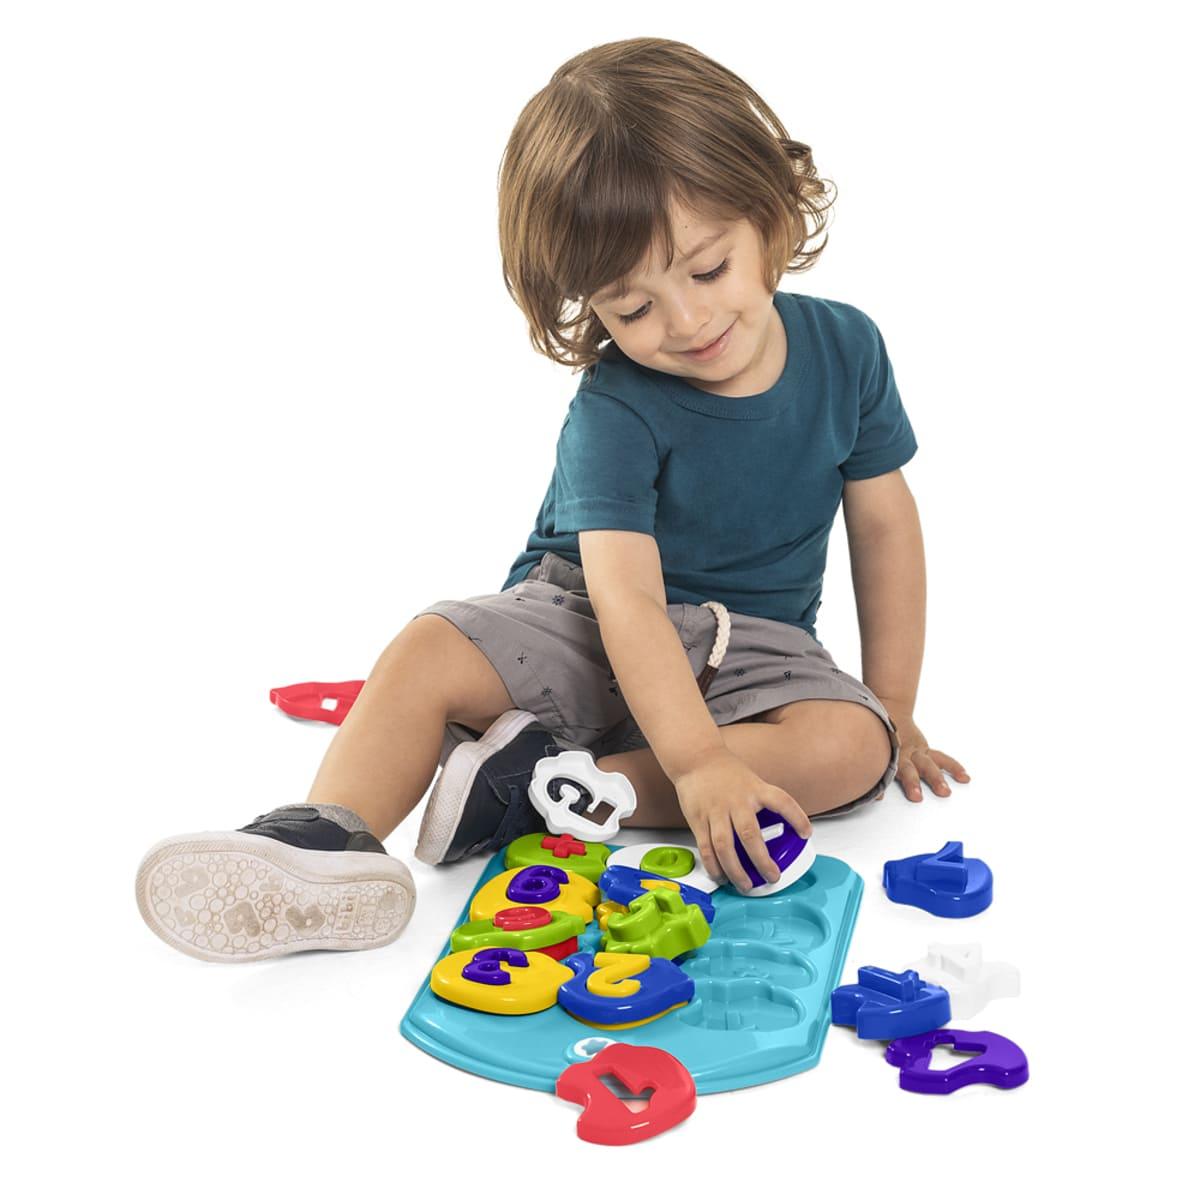 Brinquedo Educativo Encaixe Aprendendo Números Puzzle 24pçs - Tateti